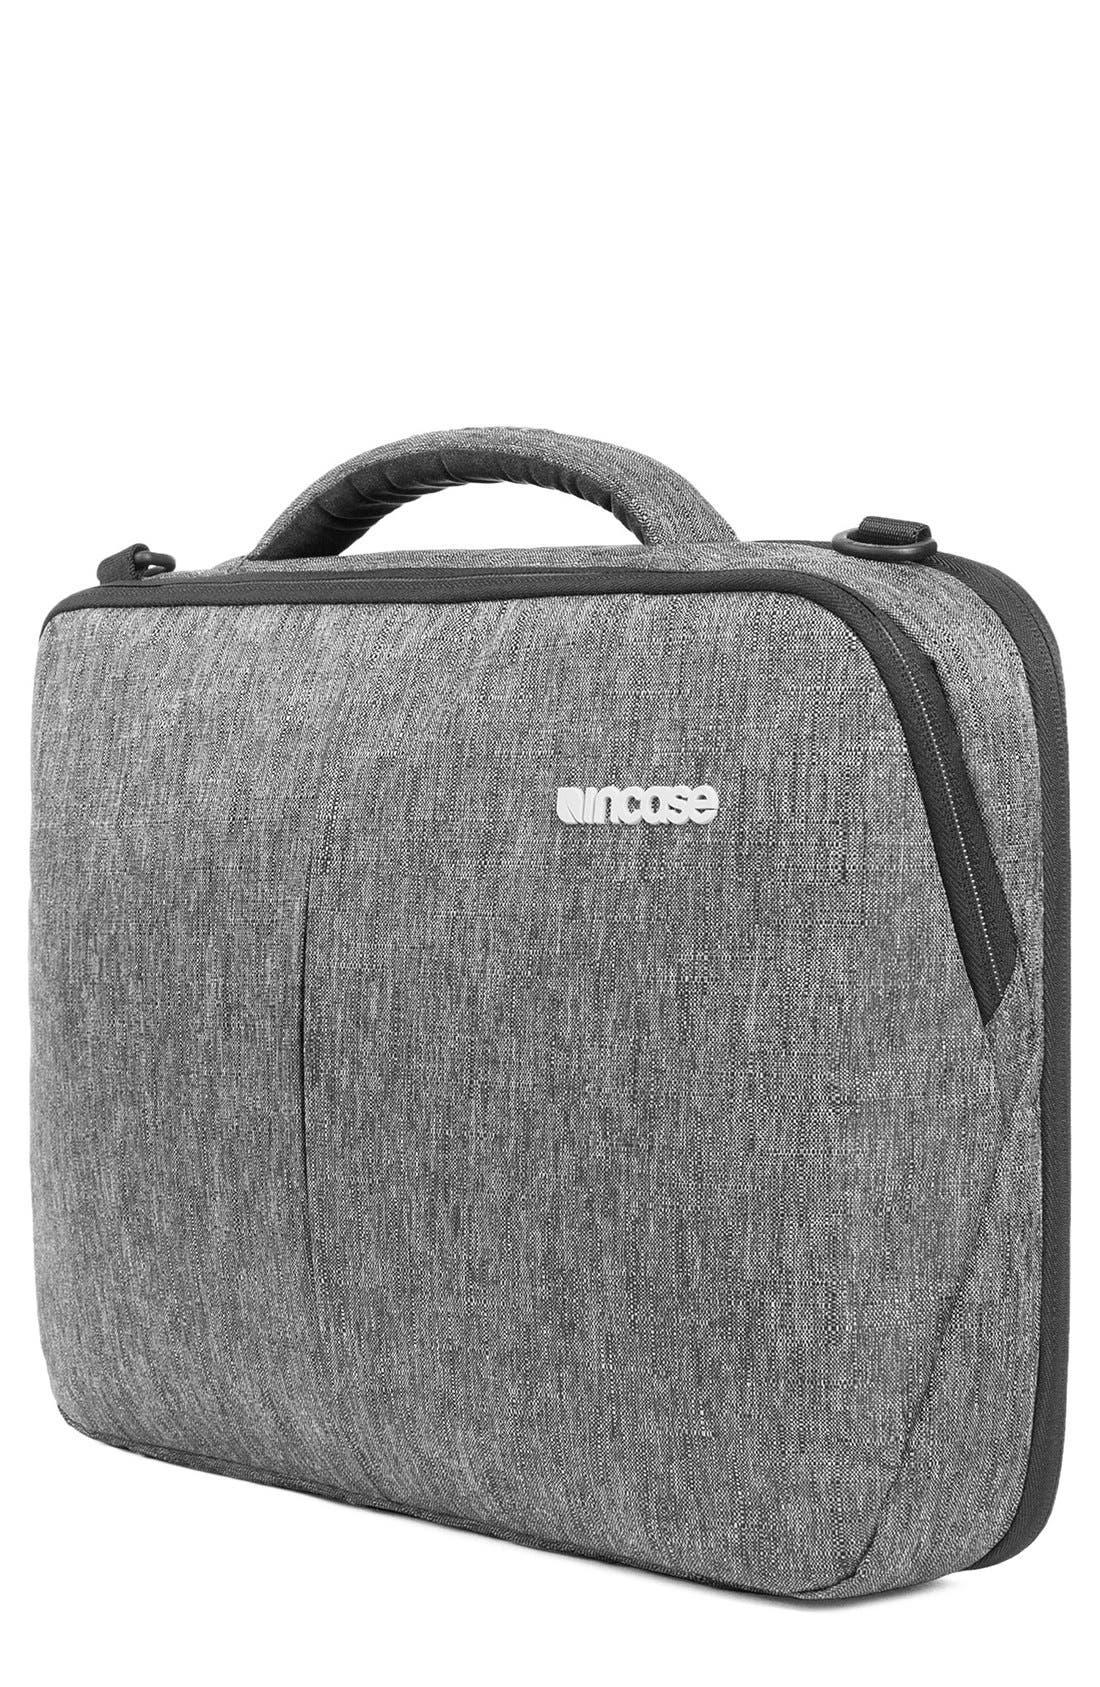 "Alternate Image 1 Selected - Incase Designs 'Reform' 13"" Laptop Briefcase"